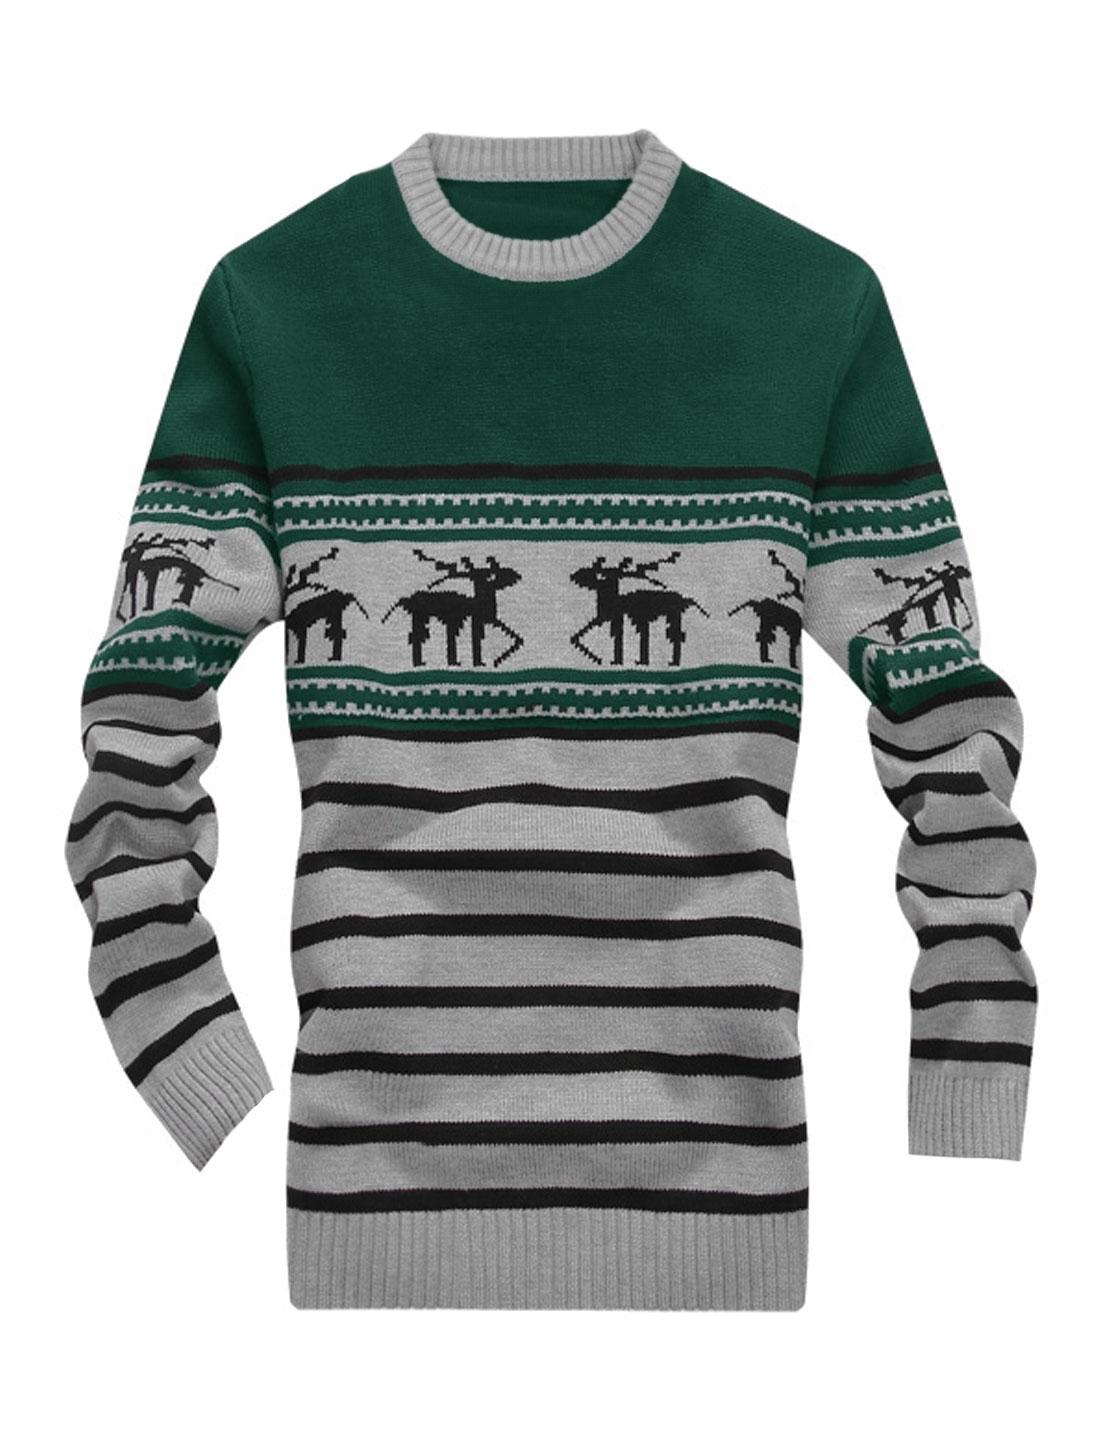 Men Newly Stylish Crew Neck Deer Pattern Zigzag Pattern Sweater Green Light Gray S